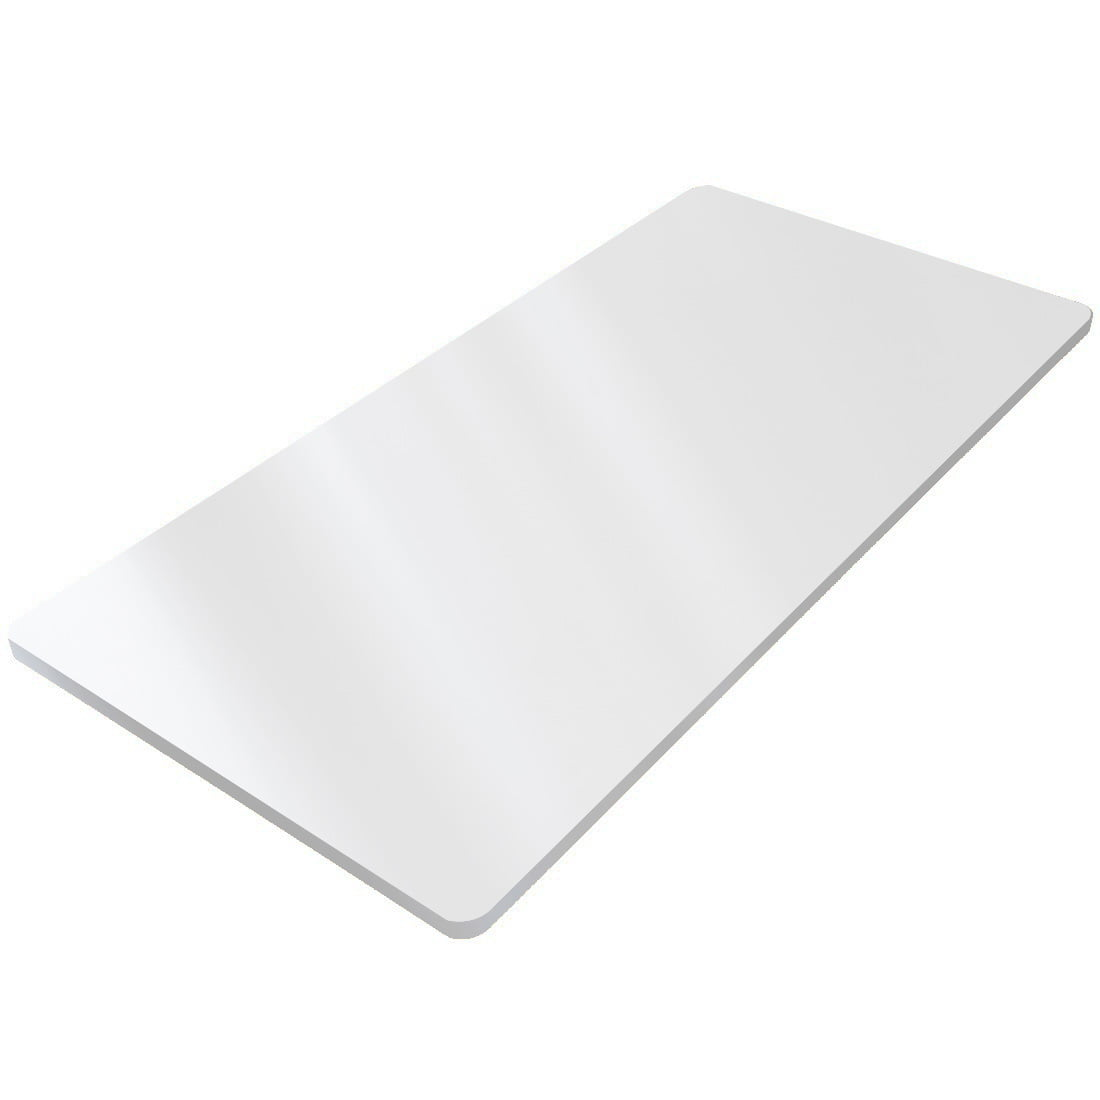 FLEXISPOTオフィステーブル用天板ホワイト